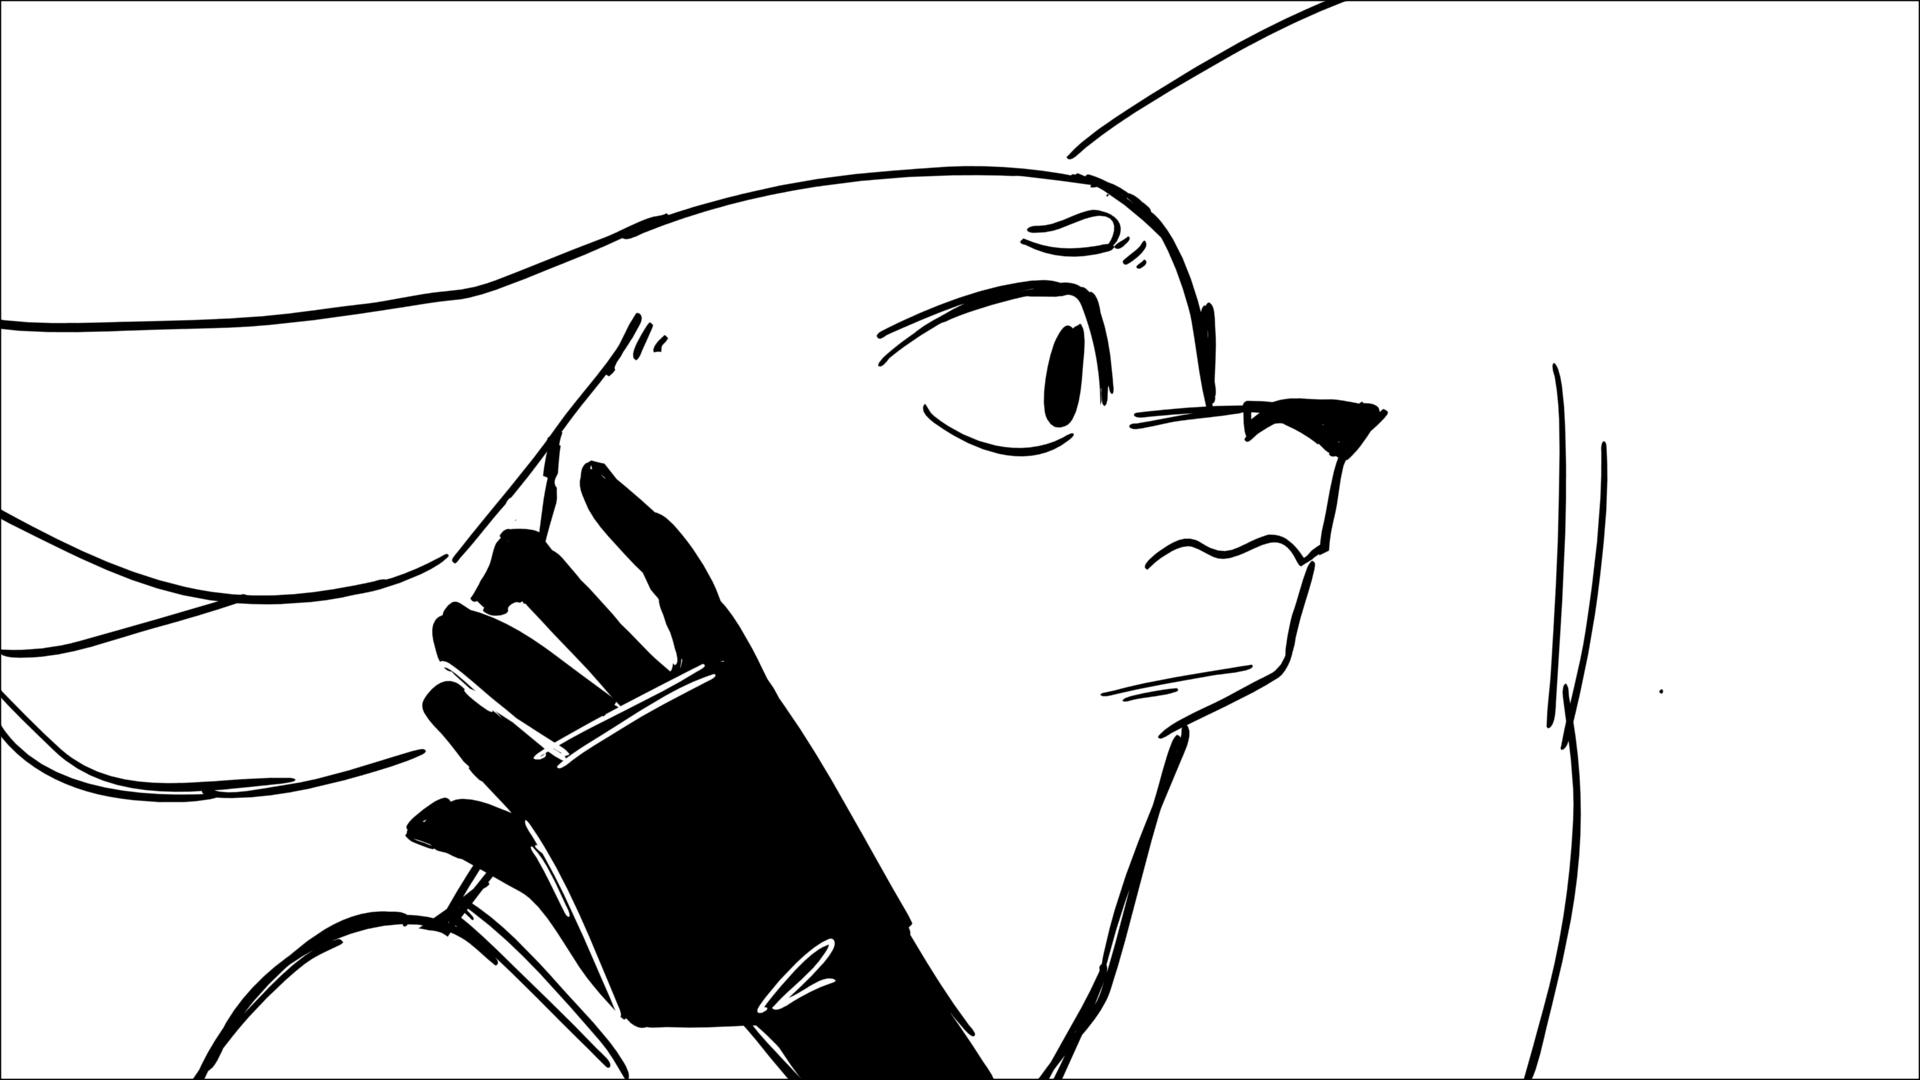 Blades of Furry-000015-01.jpg